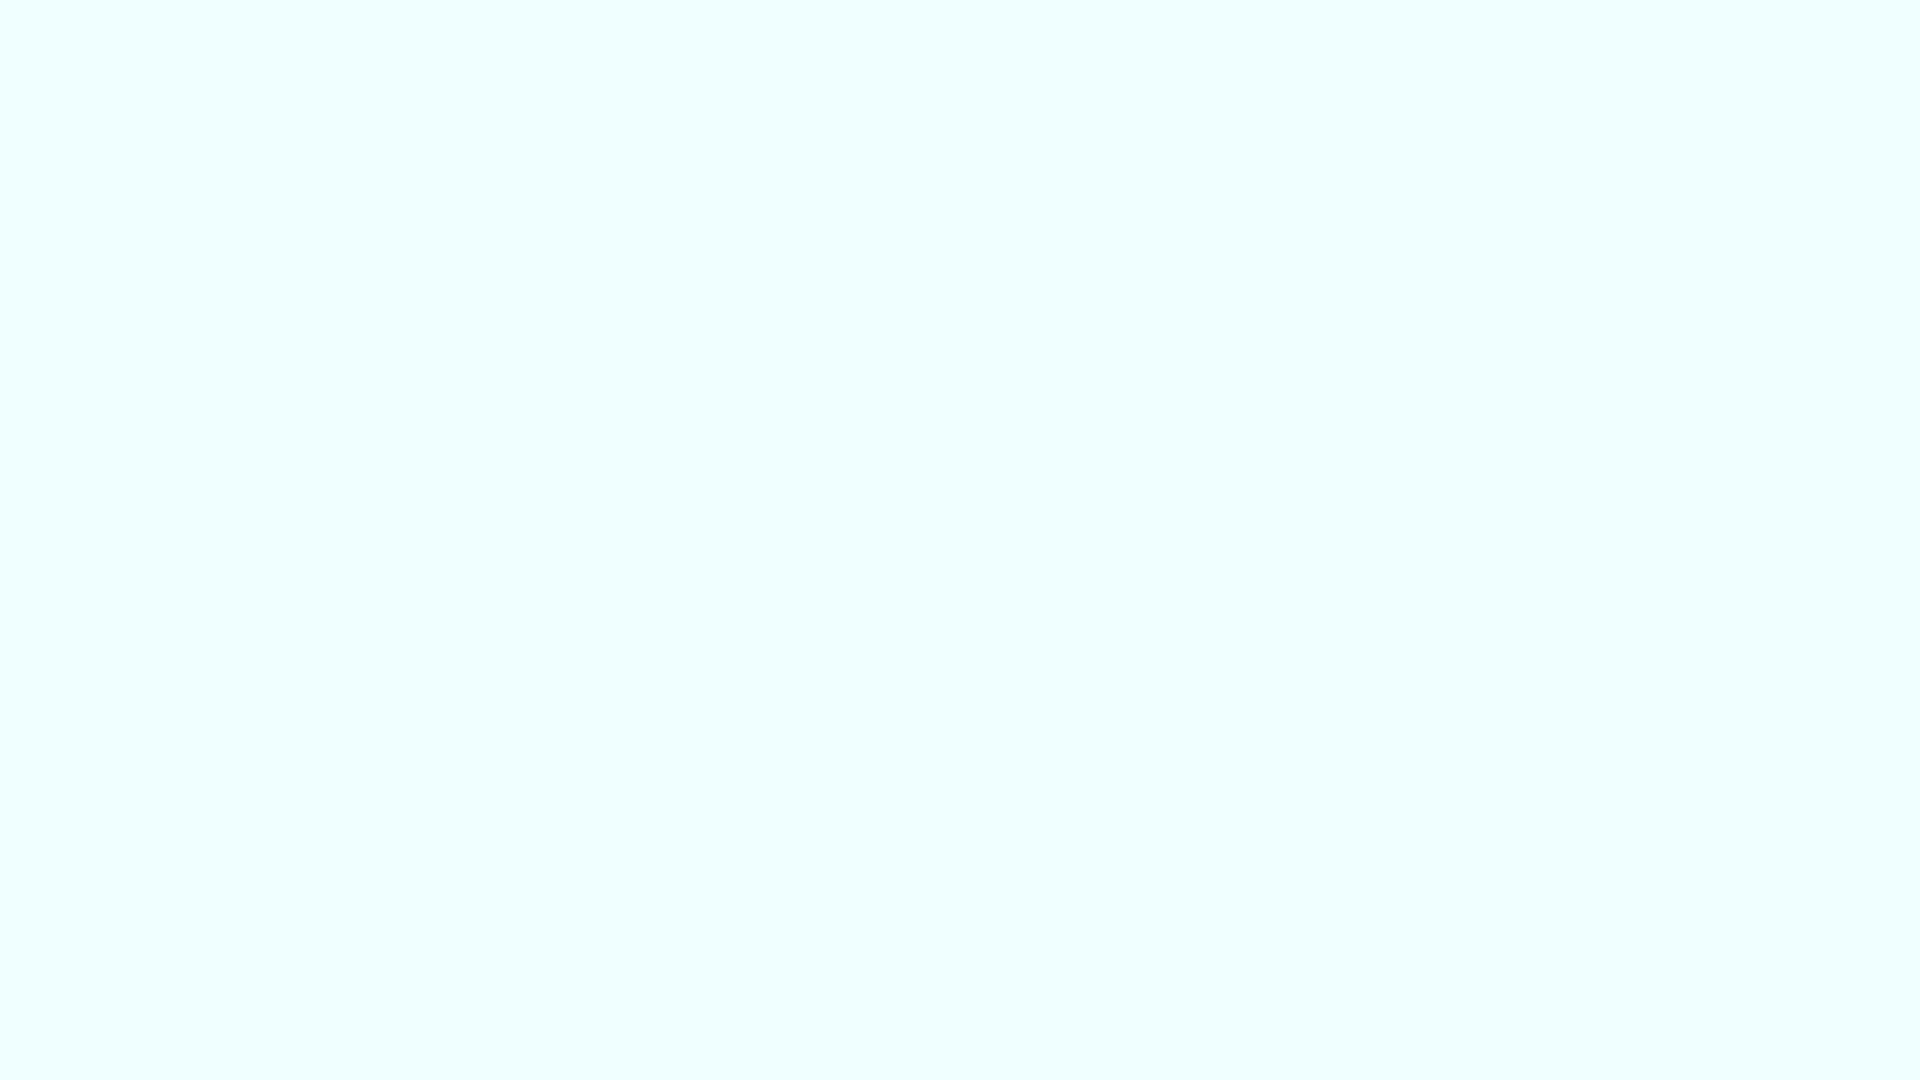 1920x1080 Azure Mist Solid Color Background